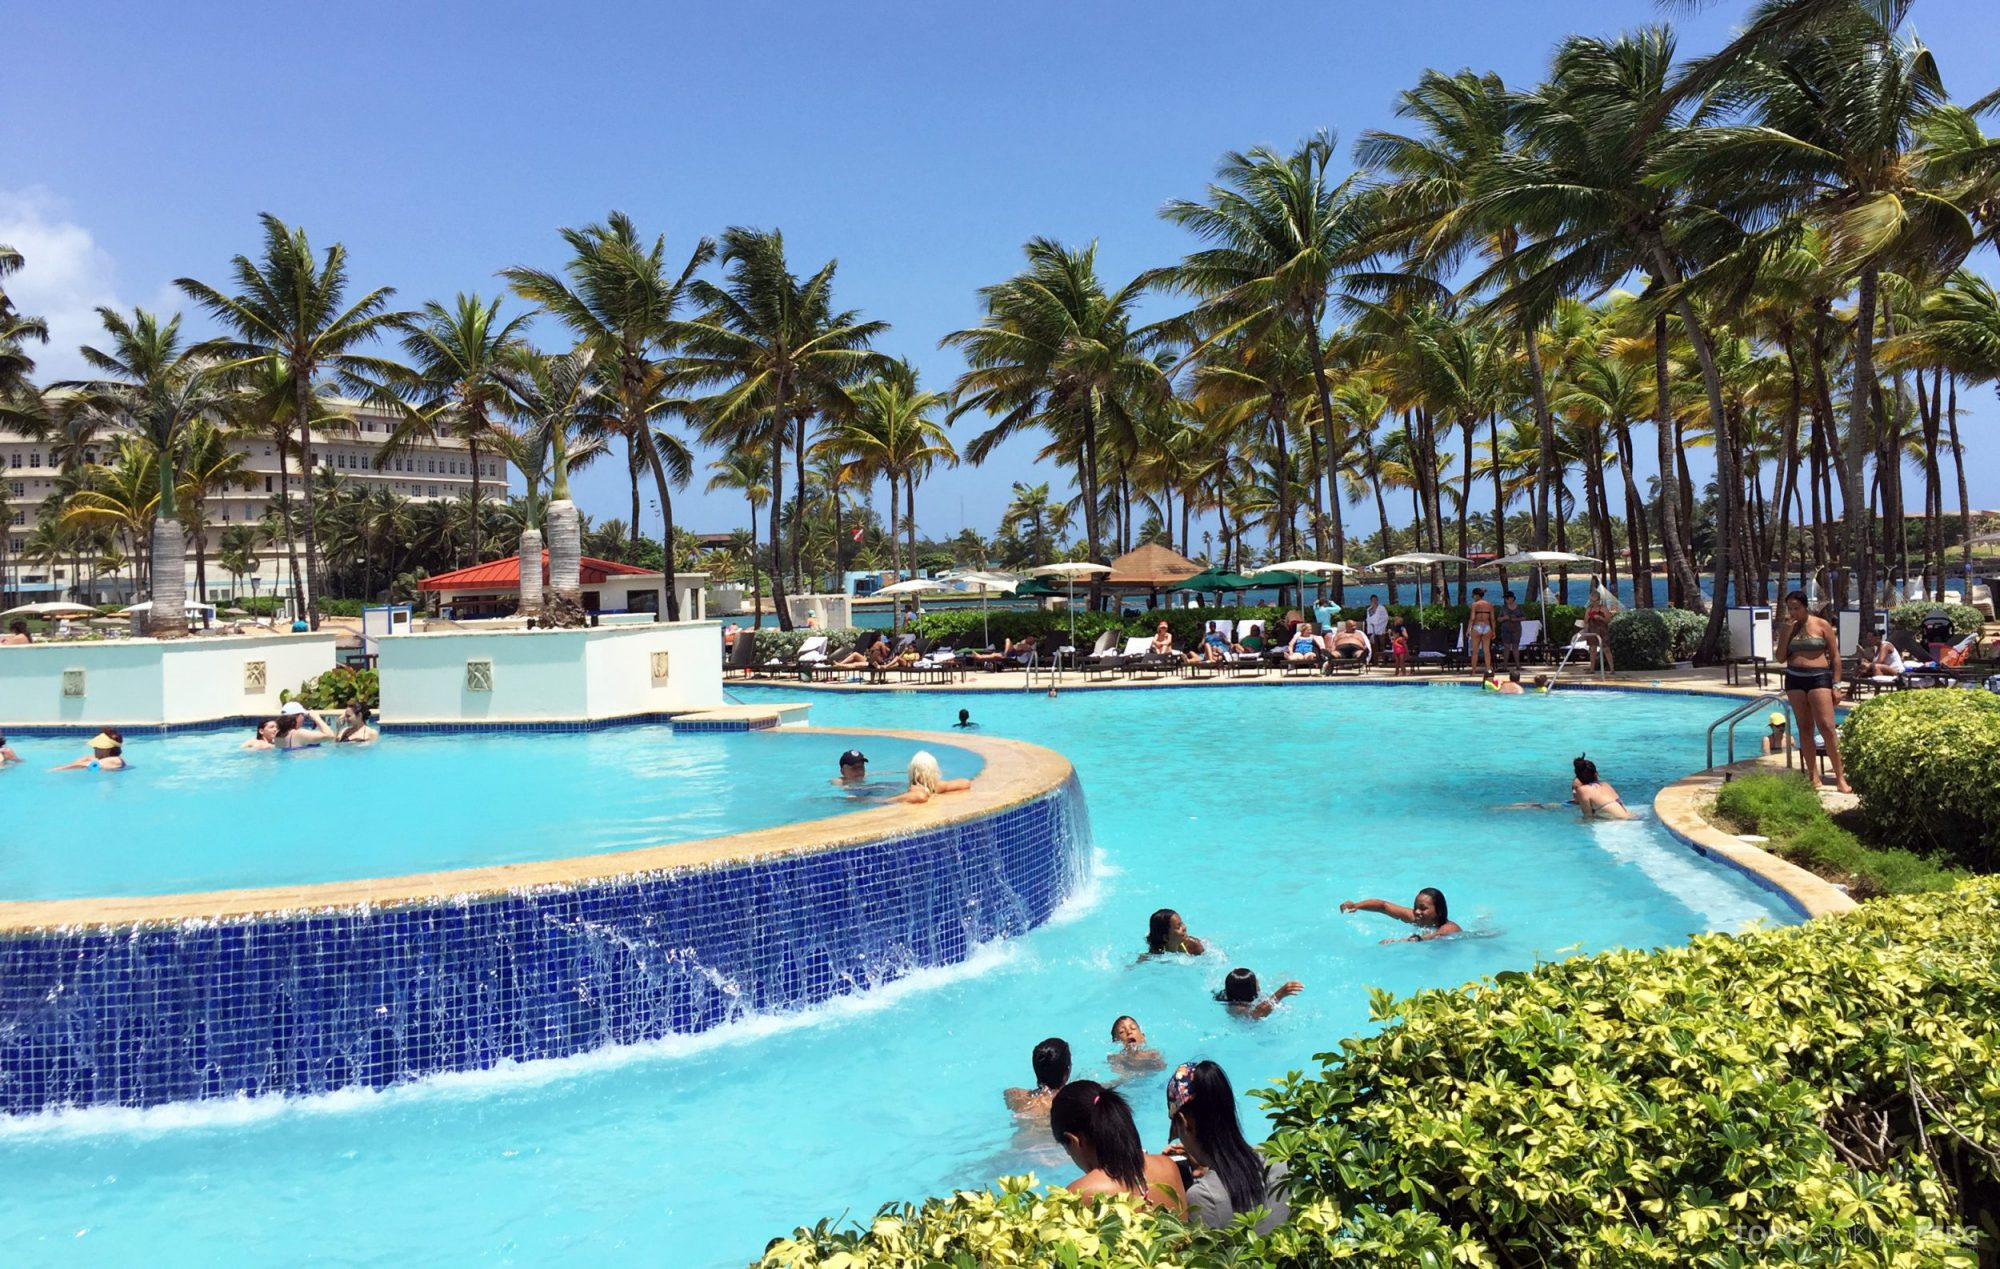 Caribe Hilton basseng